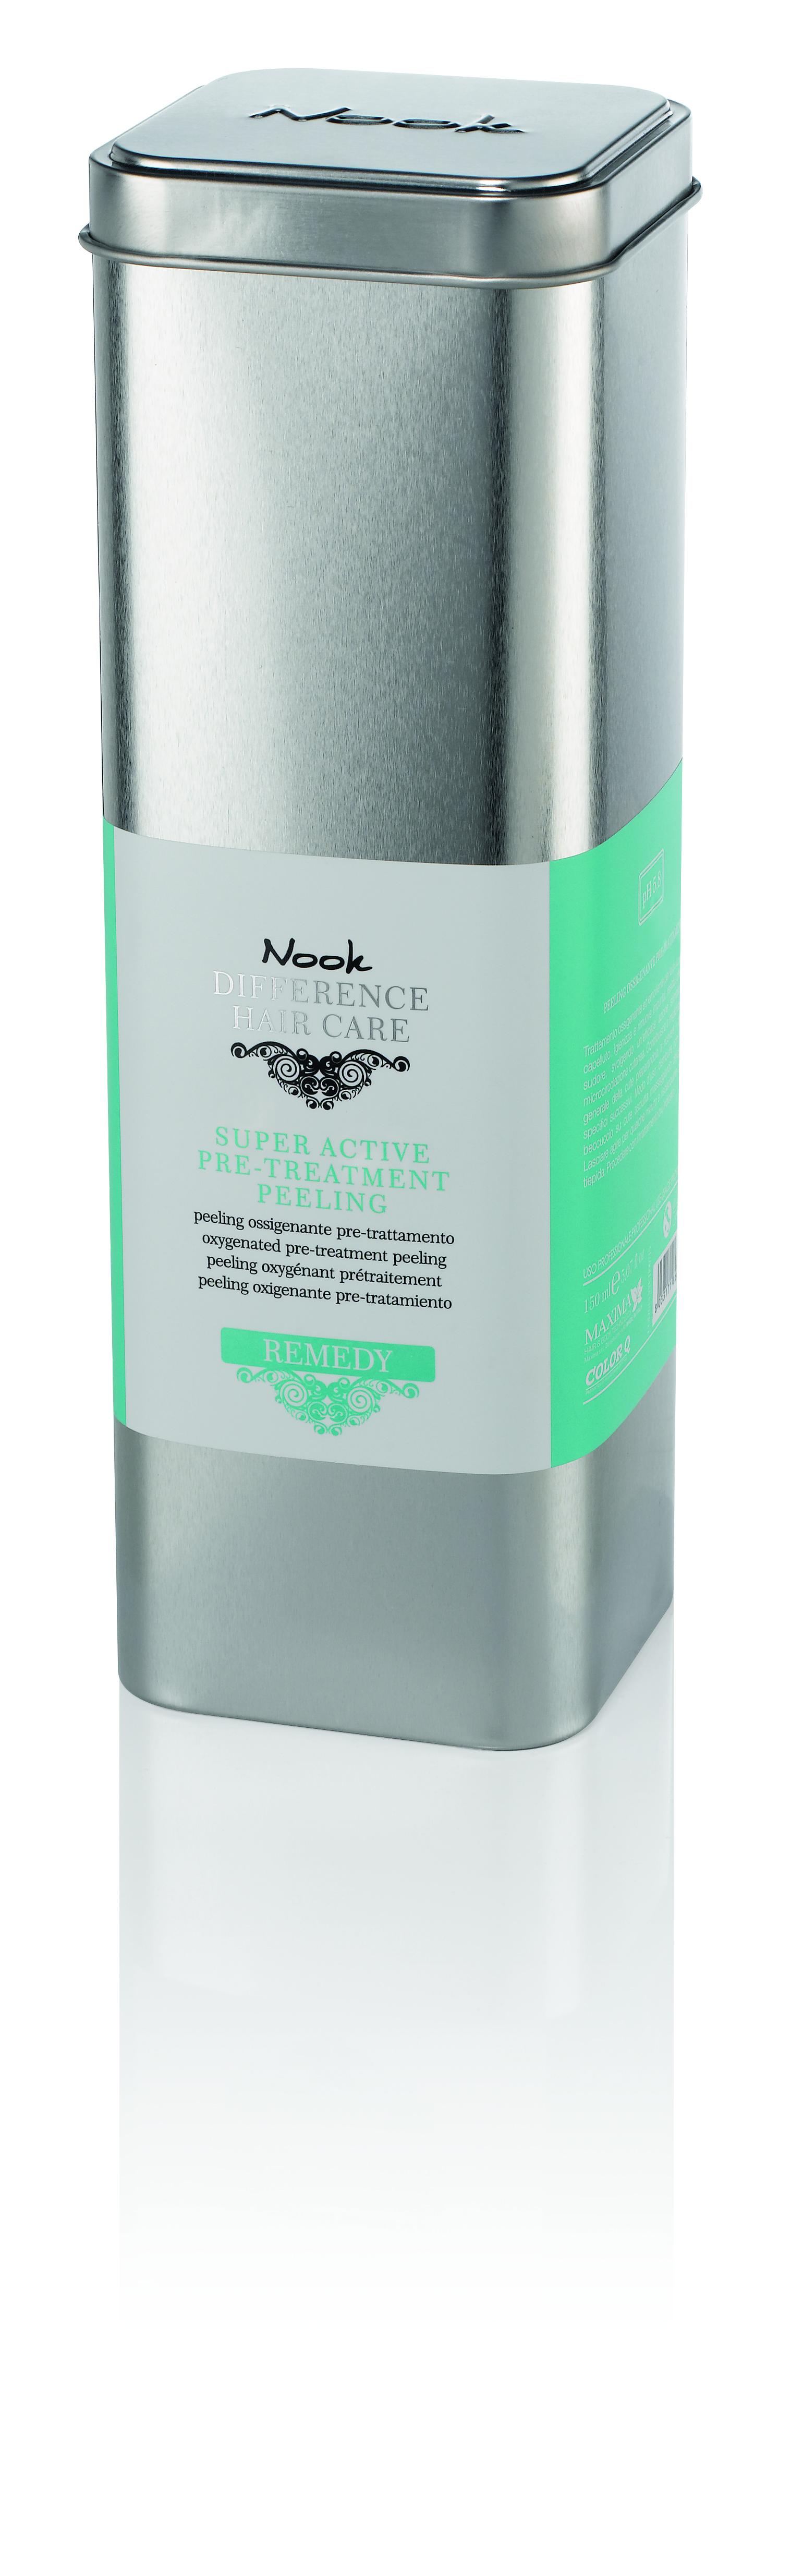 NOOK Пилинг пред-уход супер-активный для кожи головы / DIFFERENCE HAIR CARE 150мл -  Скрабы